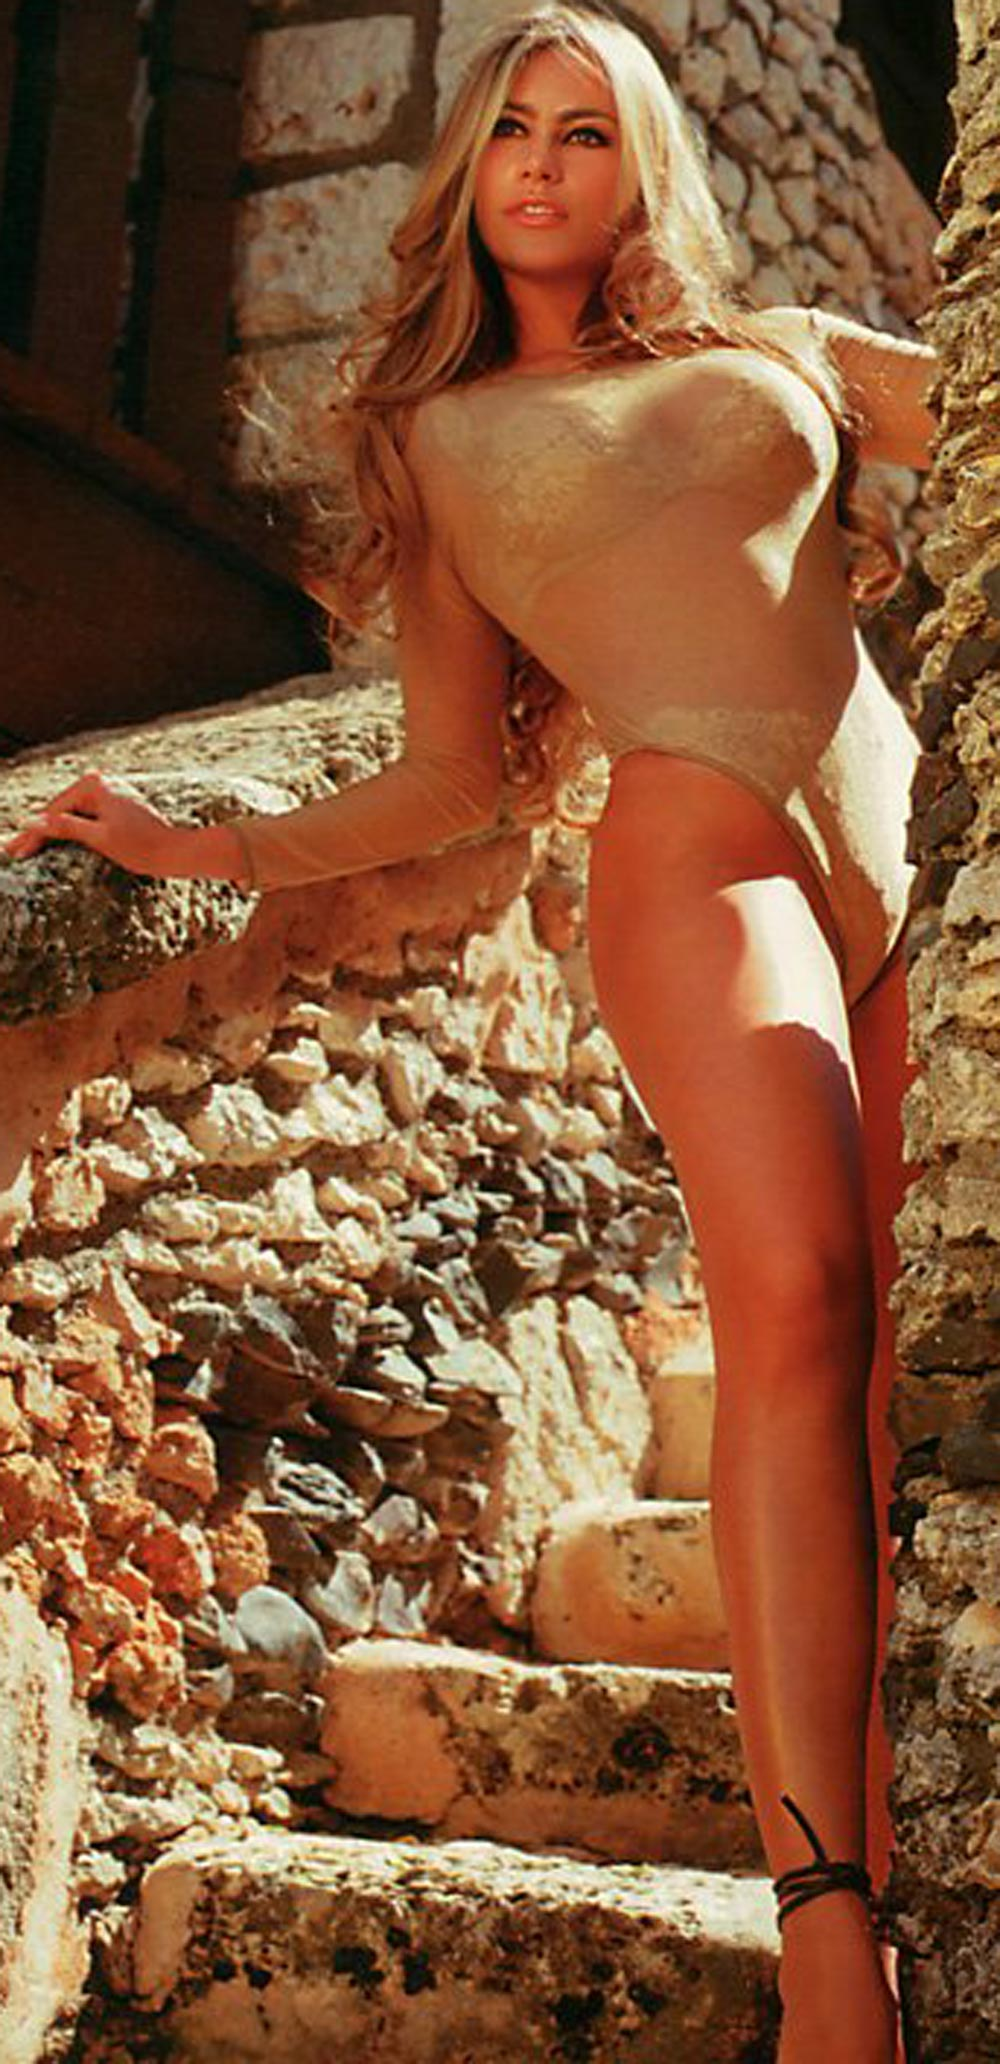 Sofia vergara nude pics